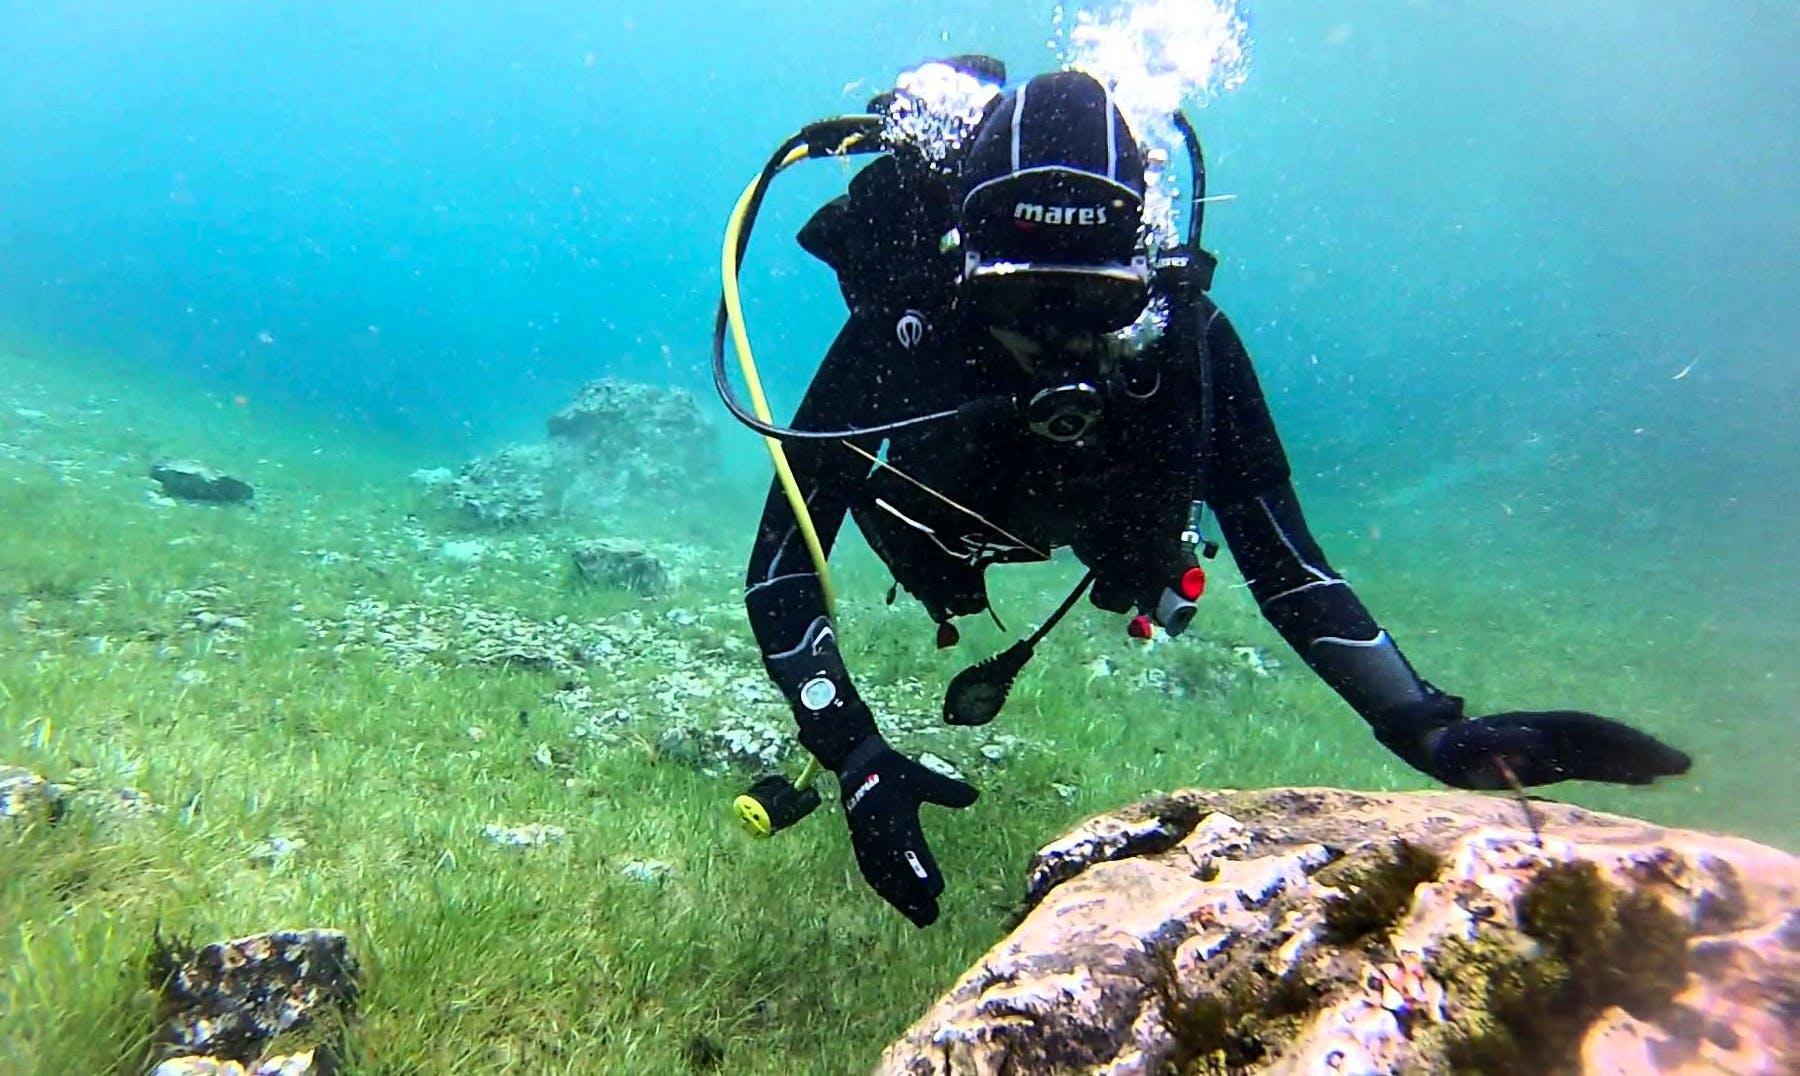 Enjoy Scuba Diving in Knittelfeld, Austria